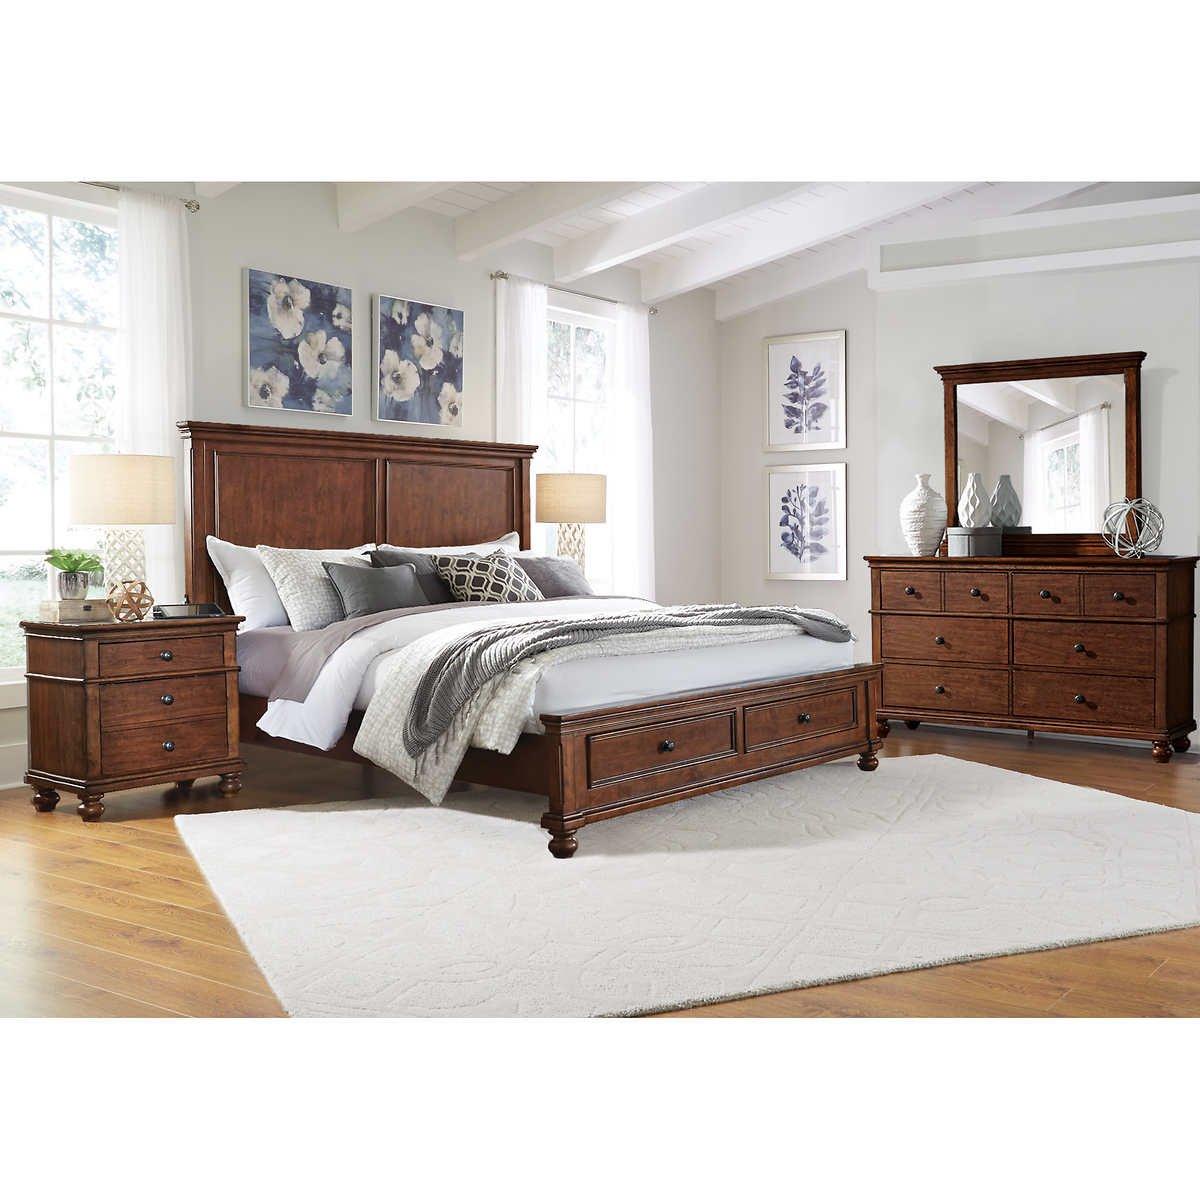 Costco Bedroom Furniture Reviews New Briar Creek 5 Piece Queen Bedroom Set